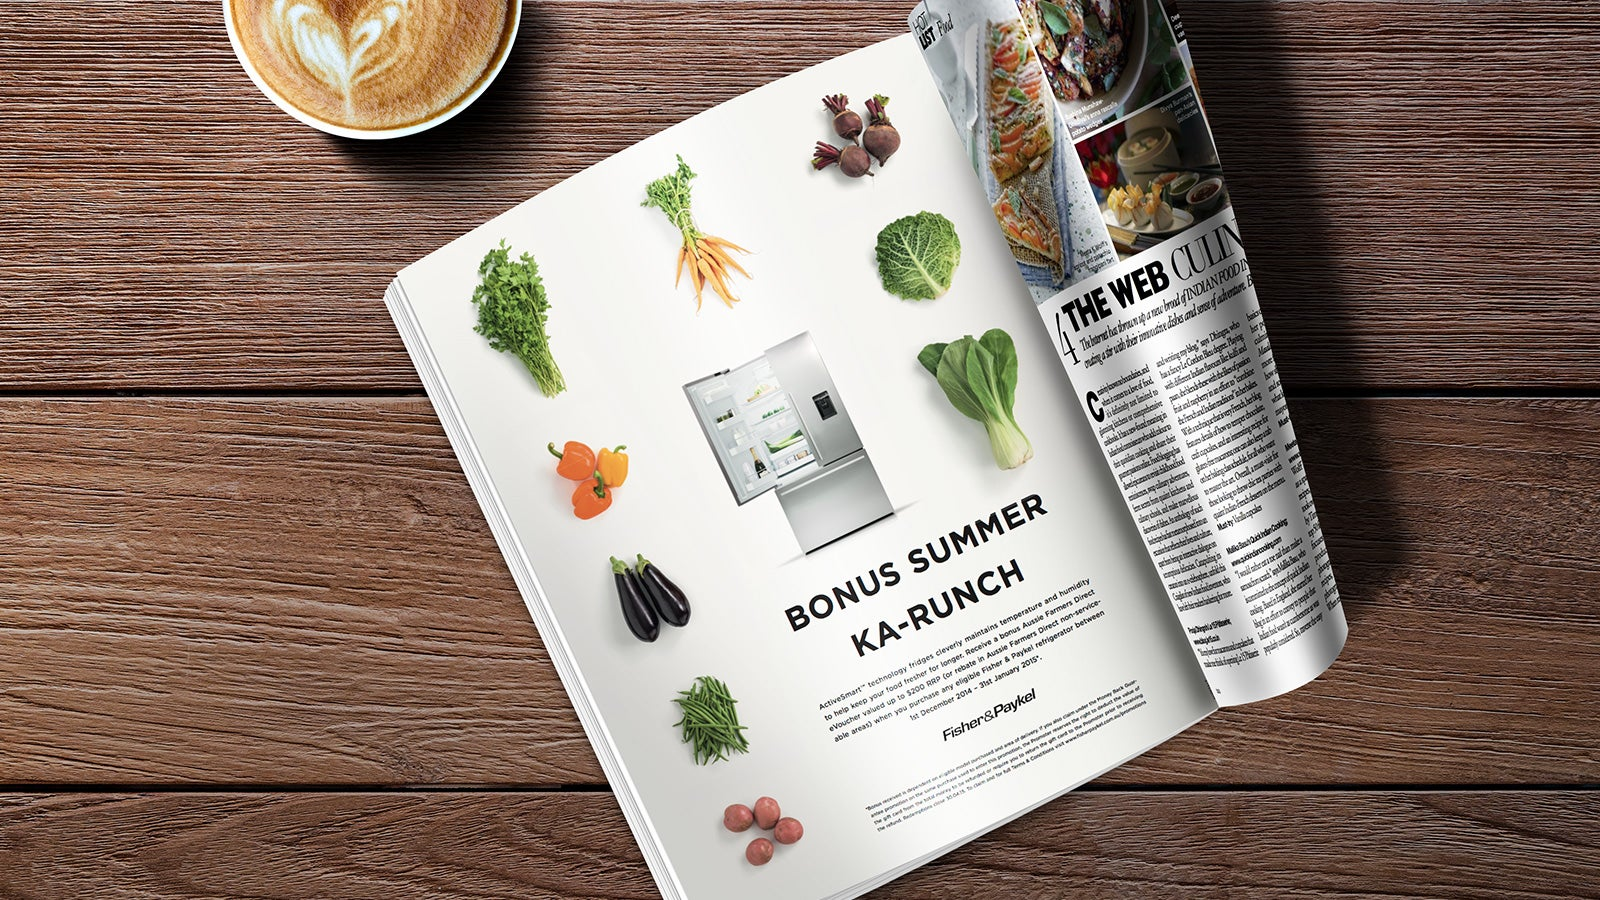 Fisher & Paykel | Ka-Runch Test campaign magazine advertisement | Devotion